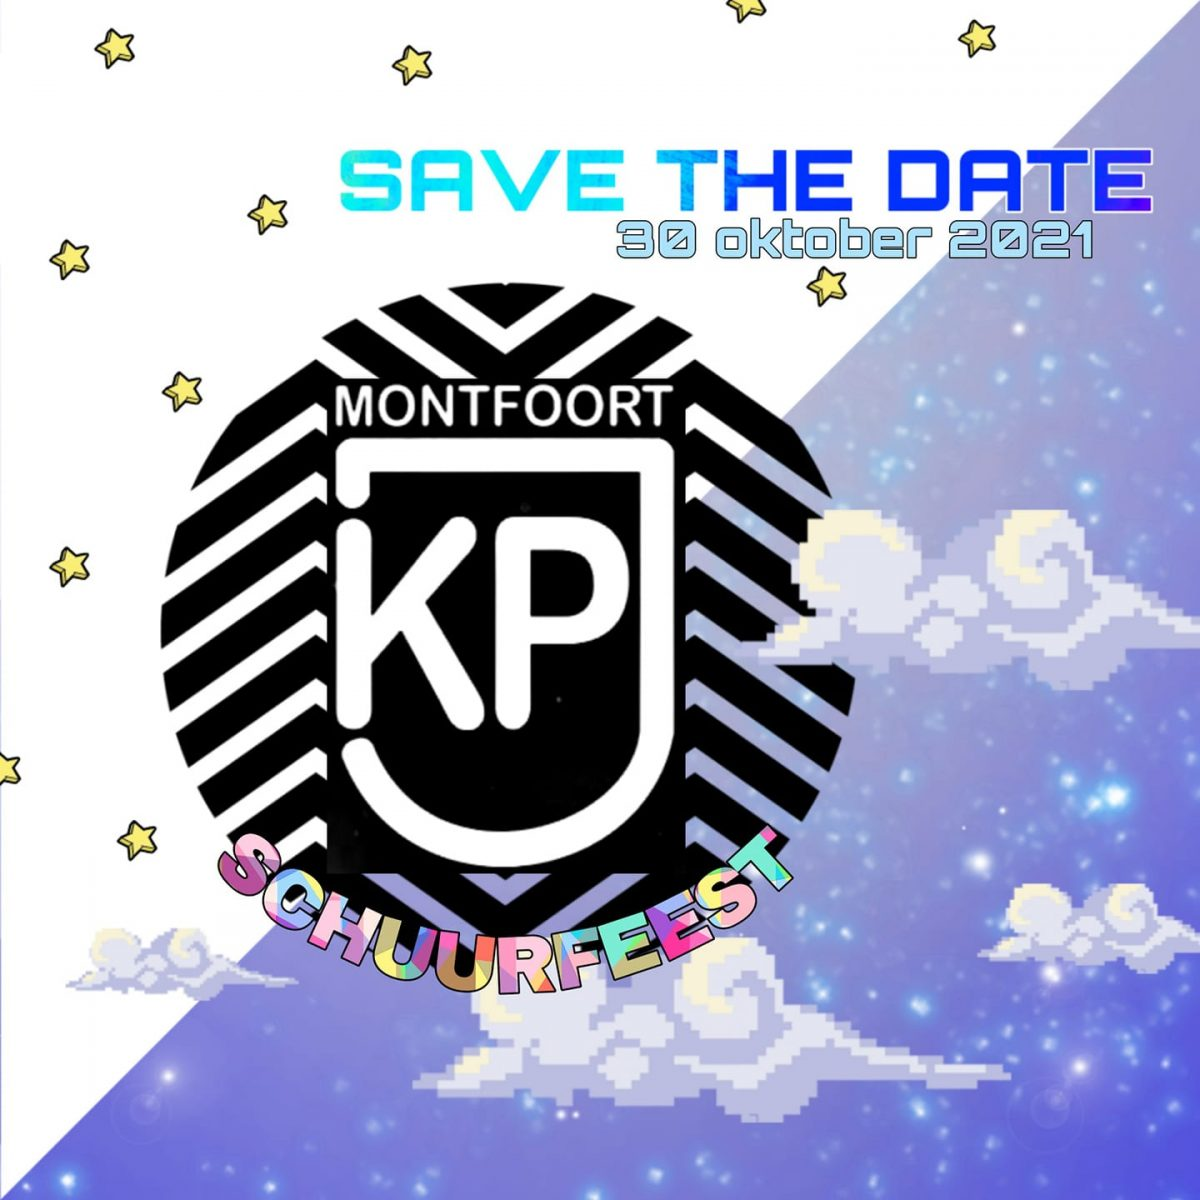 KPJ Schuurfeest 2021 poster